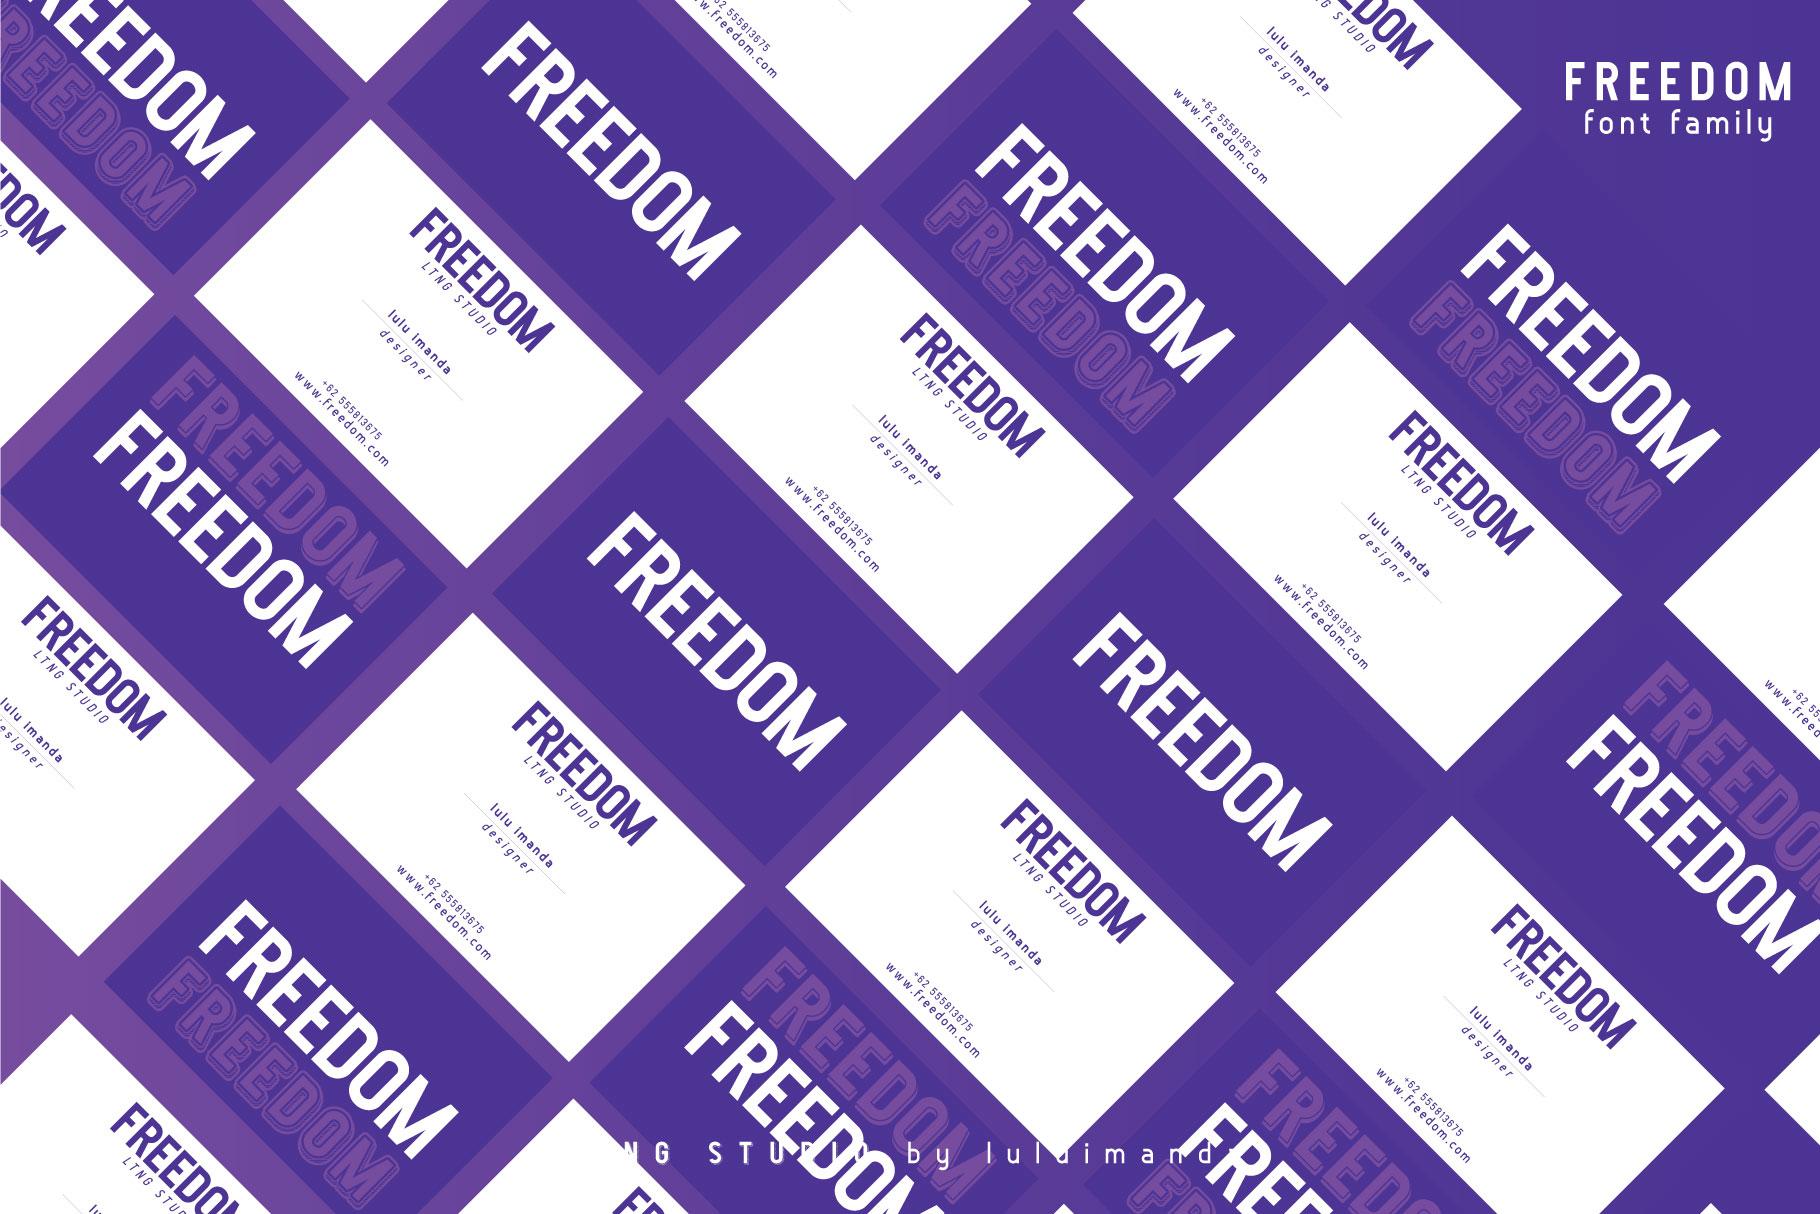 FREEDOM font family example image 11